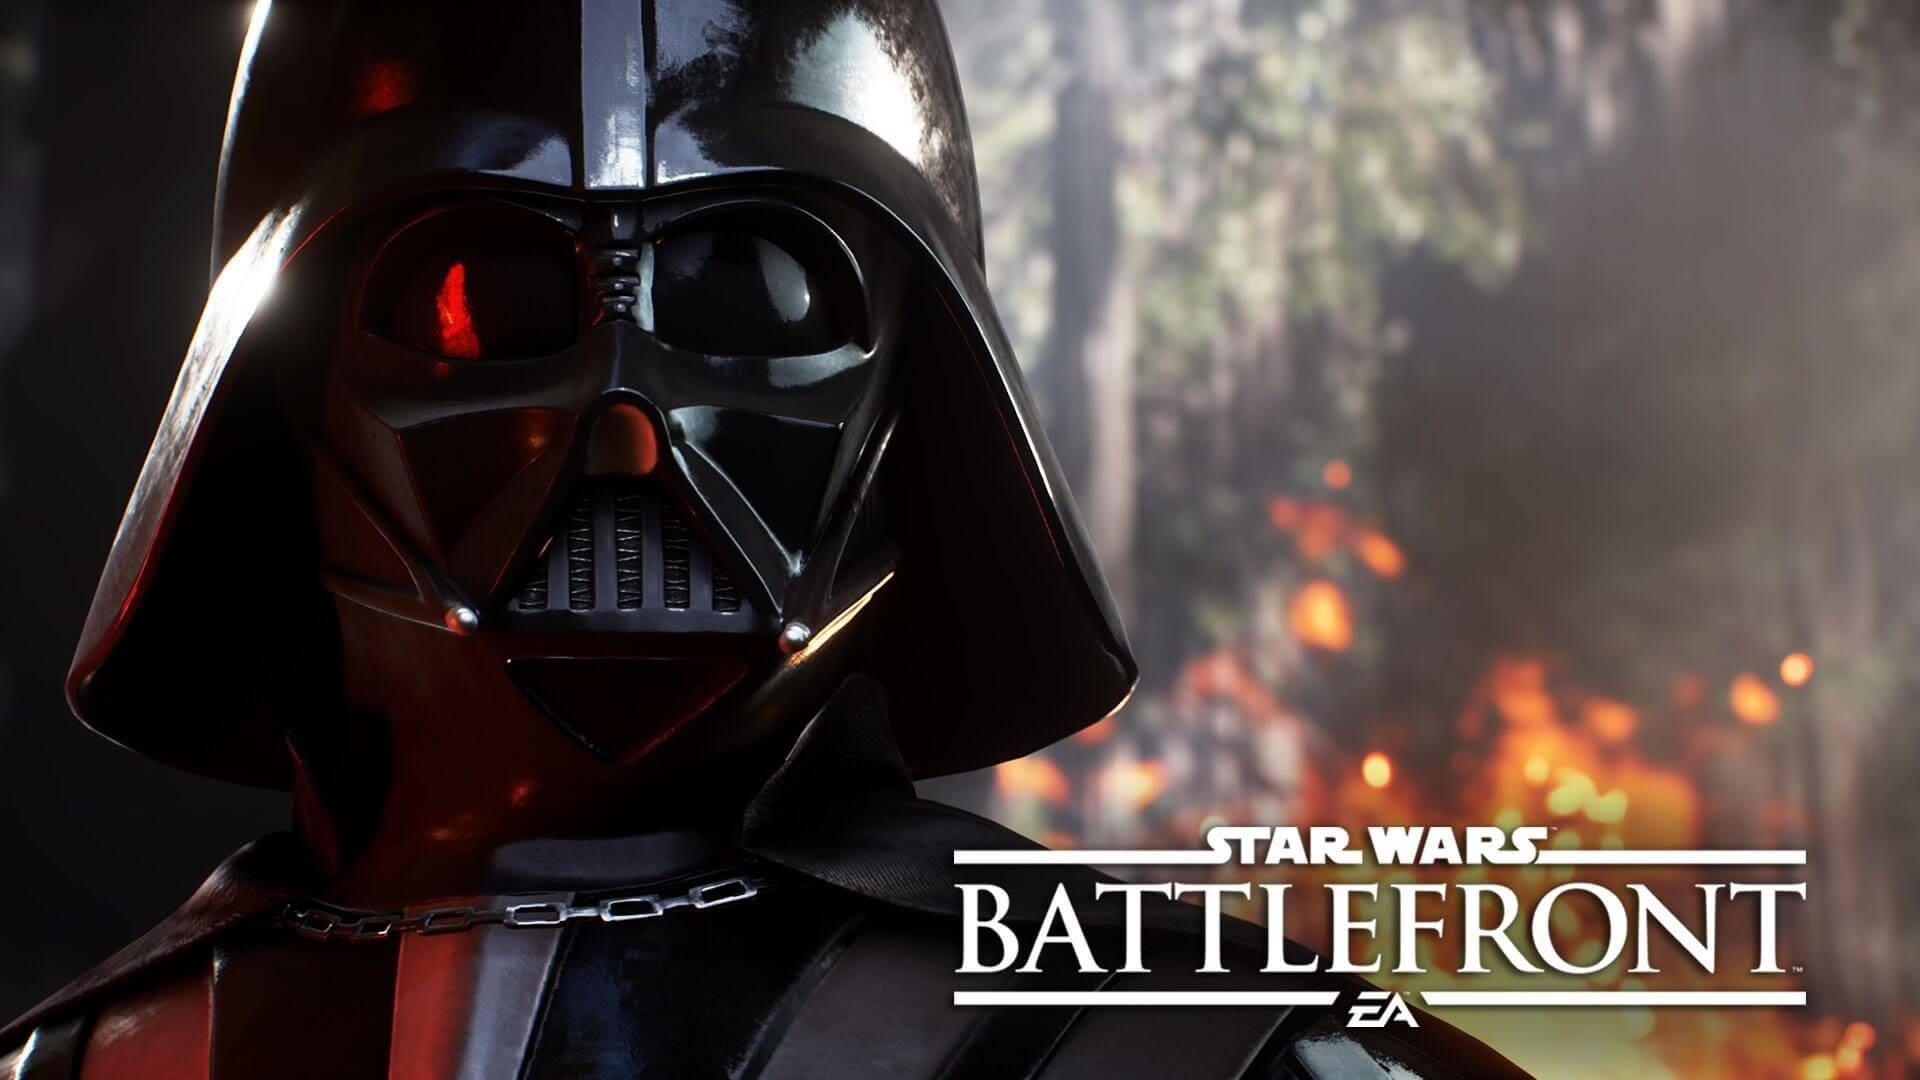 Star Wars Battlefront é anunciado na Brasil Game Show 4